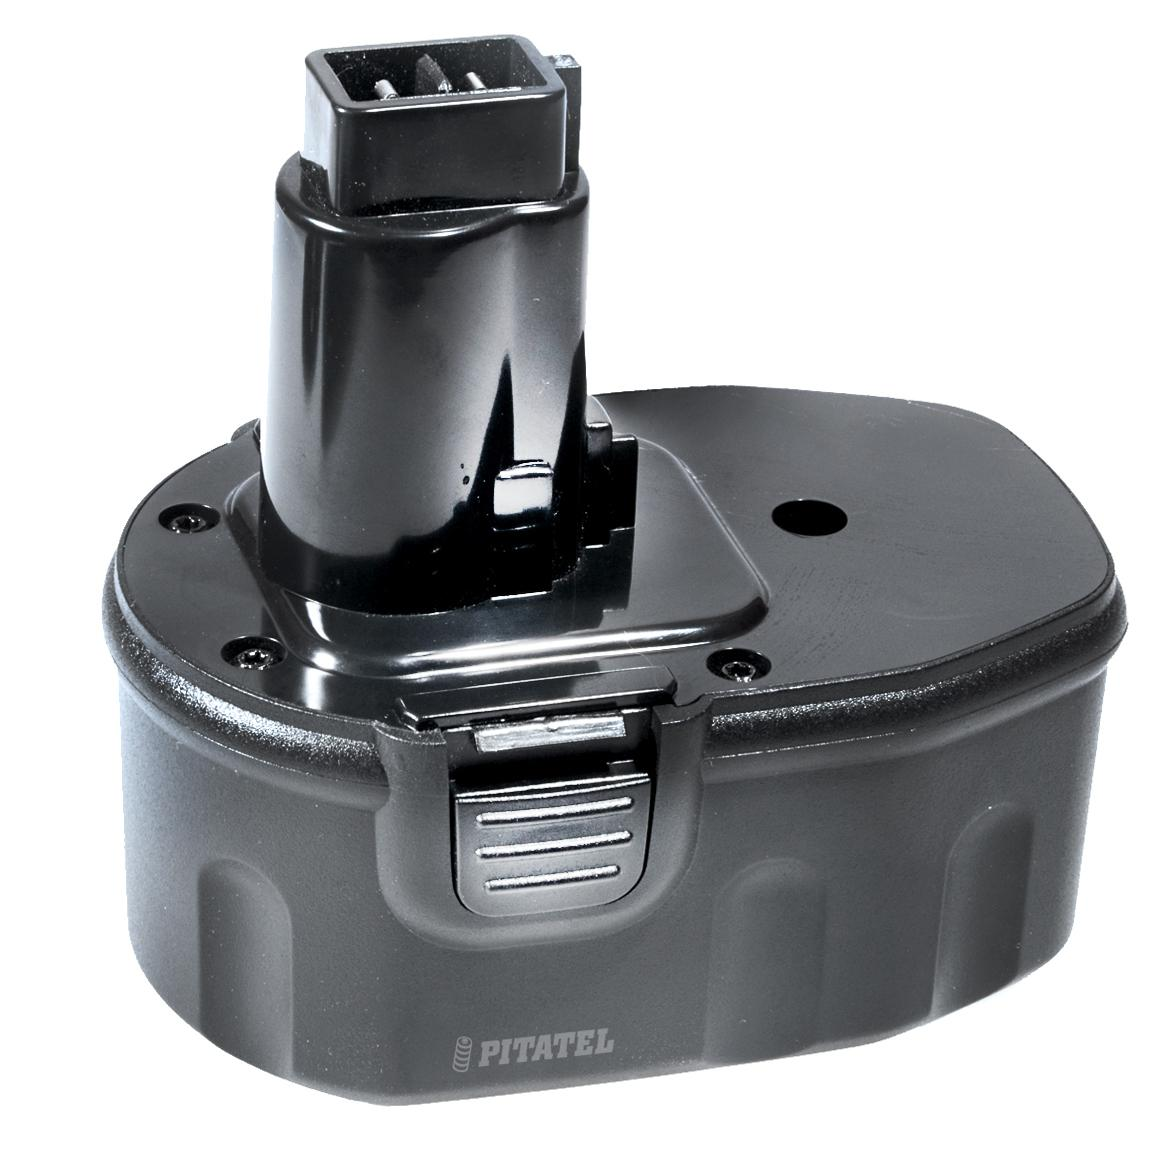 цена на Аккумулятор Pitatel Tsb-022-de14/bd14a-13c